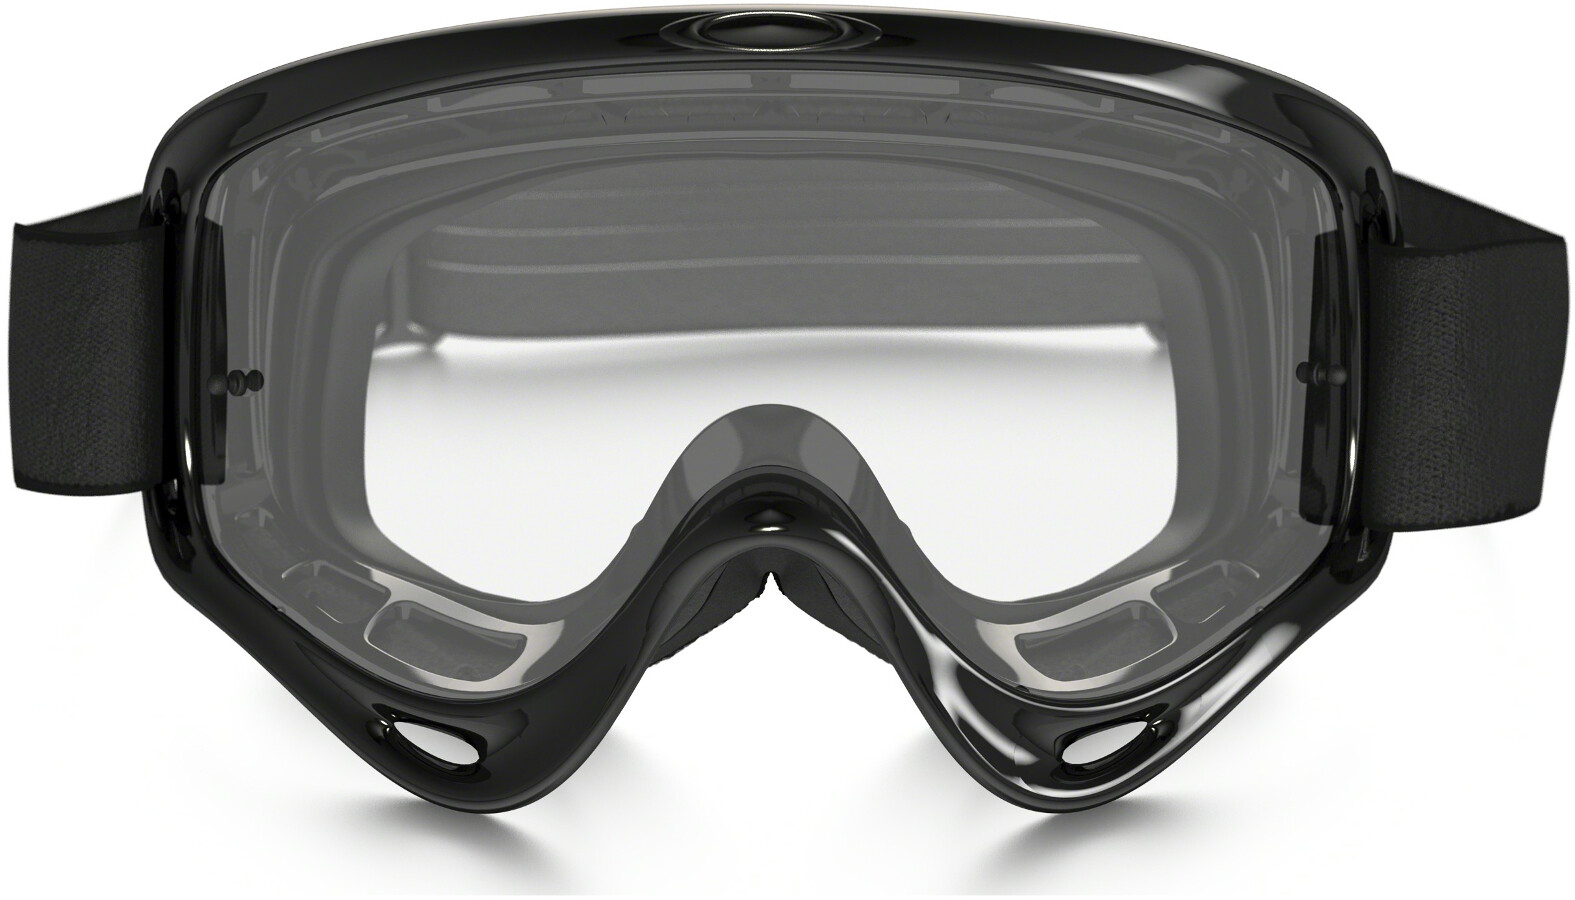 Oakley O Frame MX jet black I Eenvoudig online bij Bikester d303ec4810b